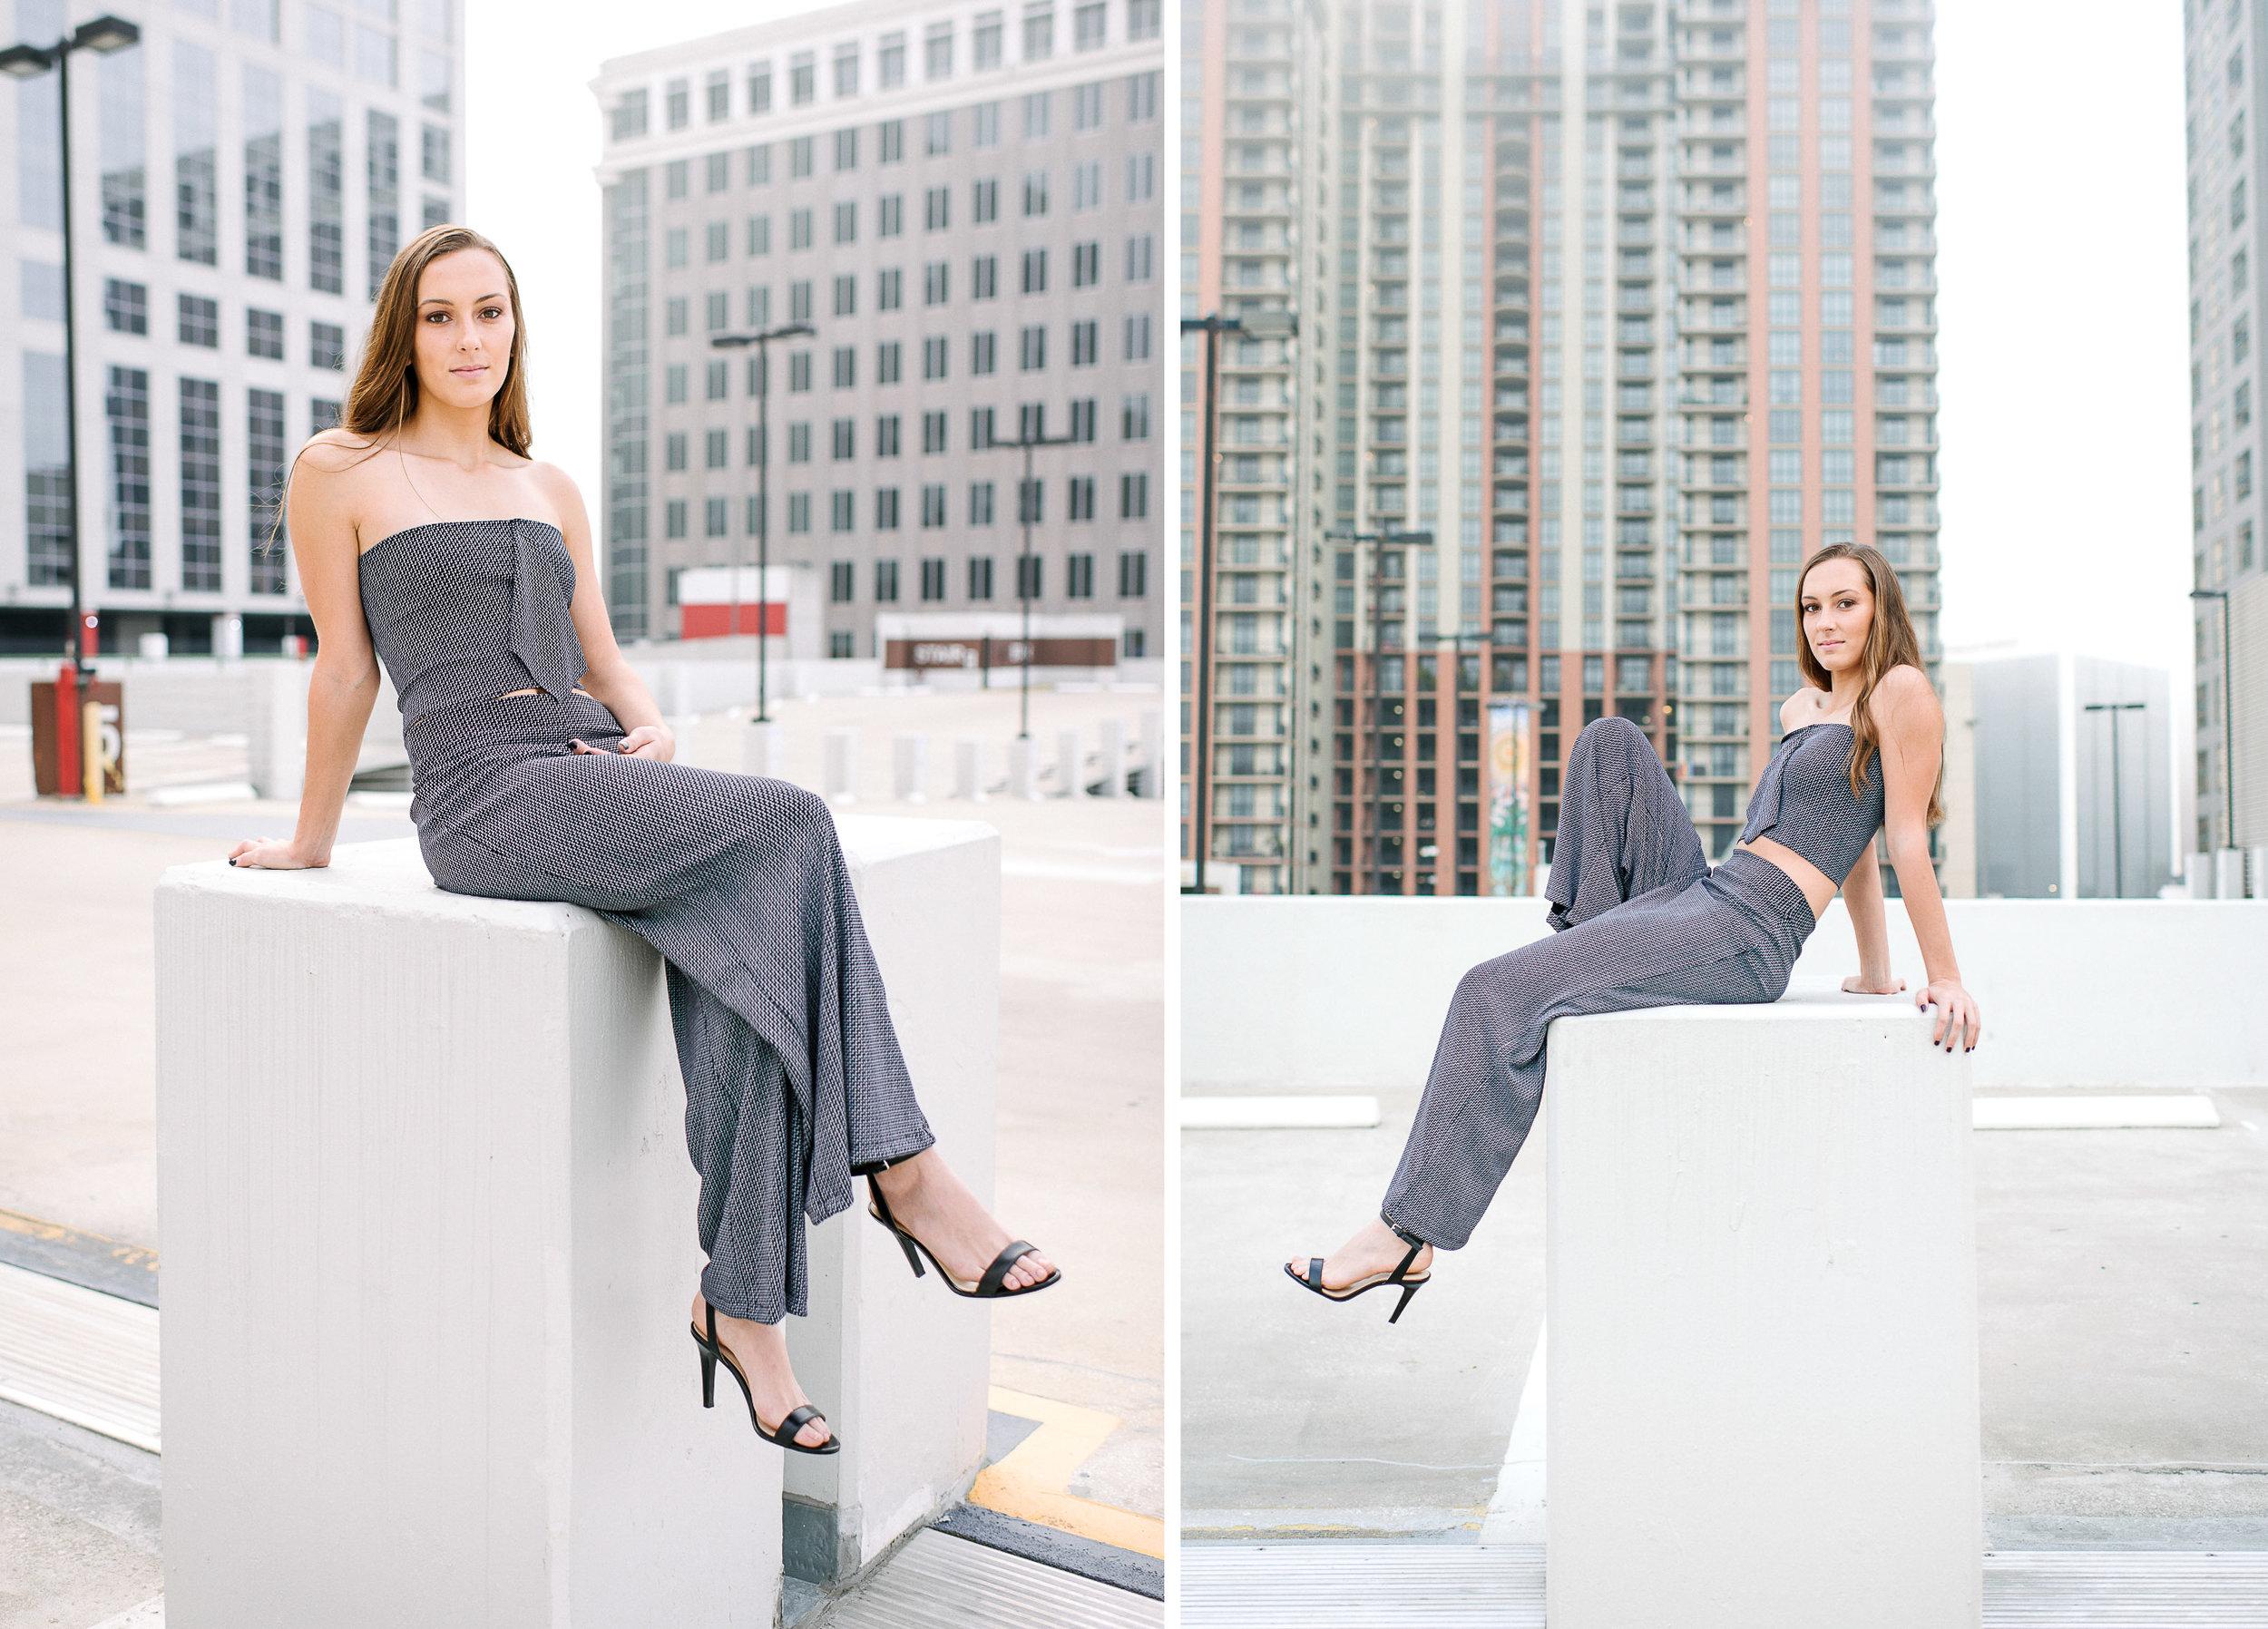 KateTaramykinStudios-Orlando-Fashion-Portraits-MID-8.jpg